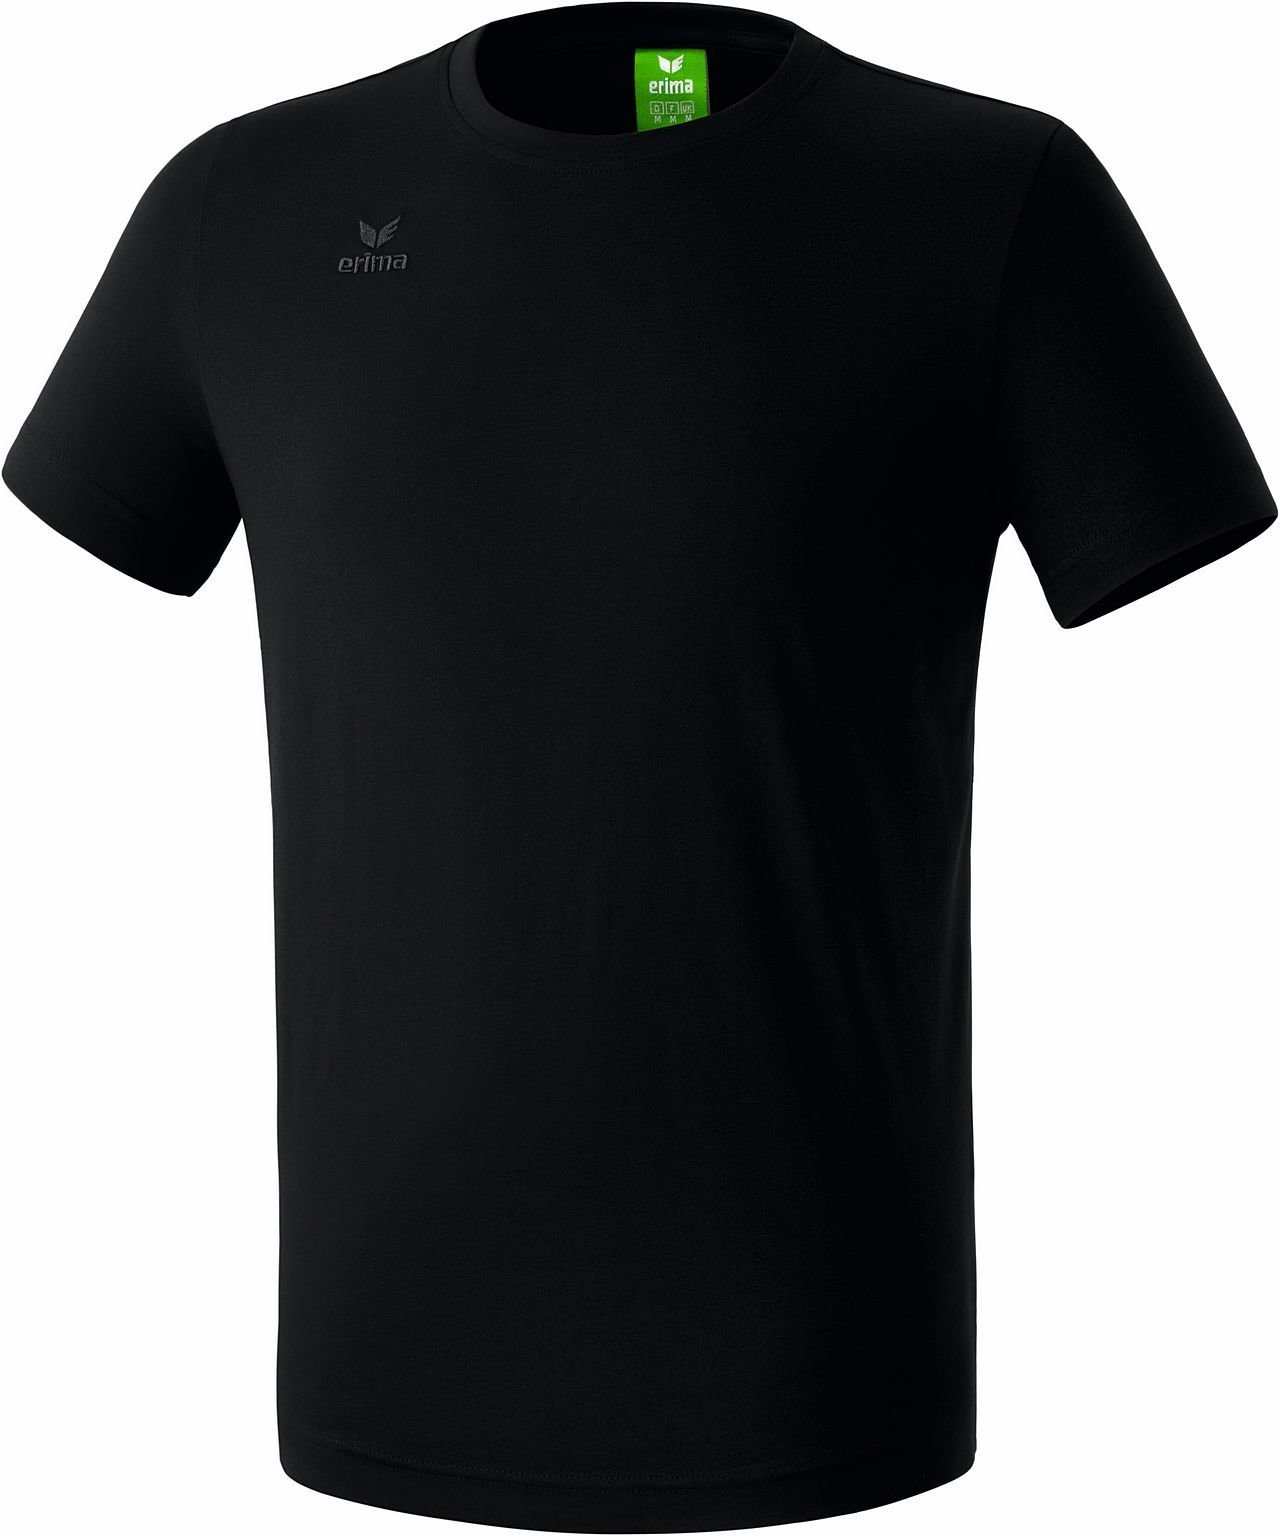 Baumwolle T-Shirt Kinder a0208330